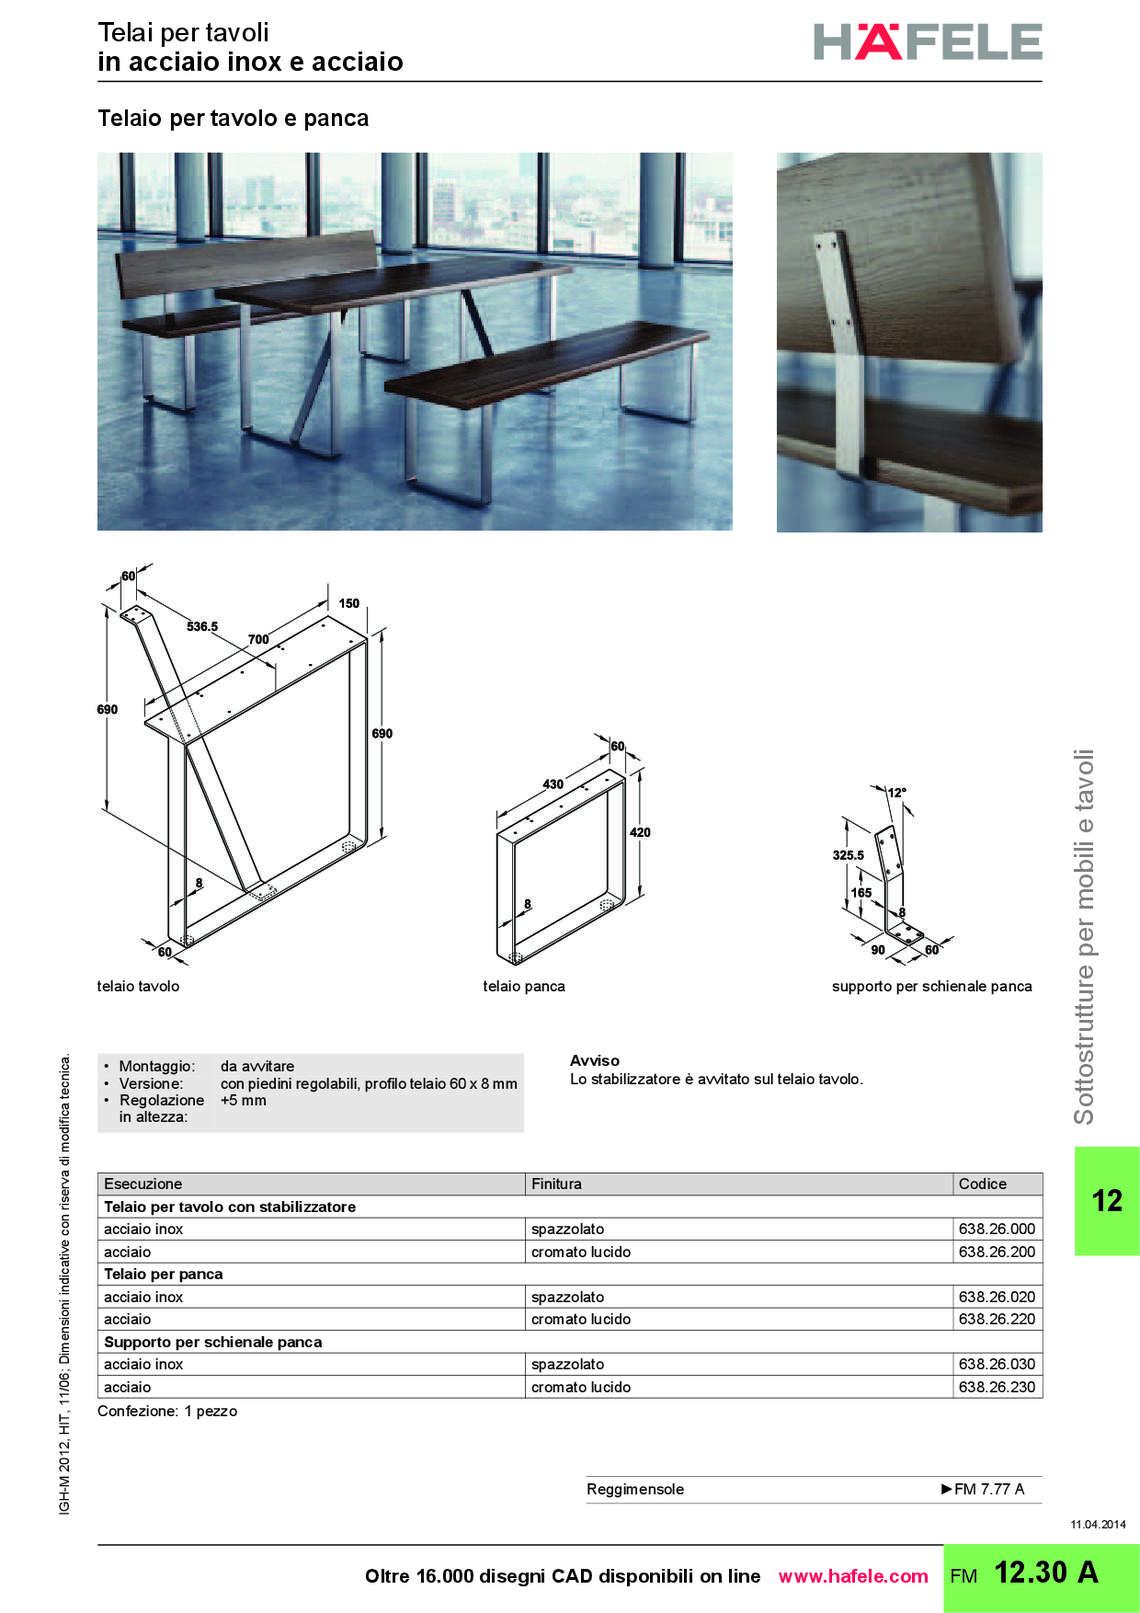 hafele-sottostrutture-per-mobili_83_052.jpg